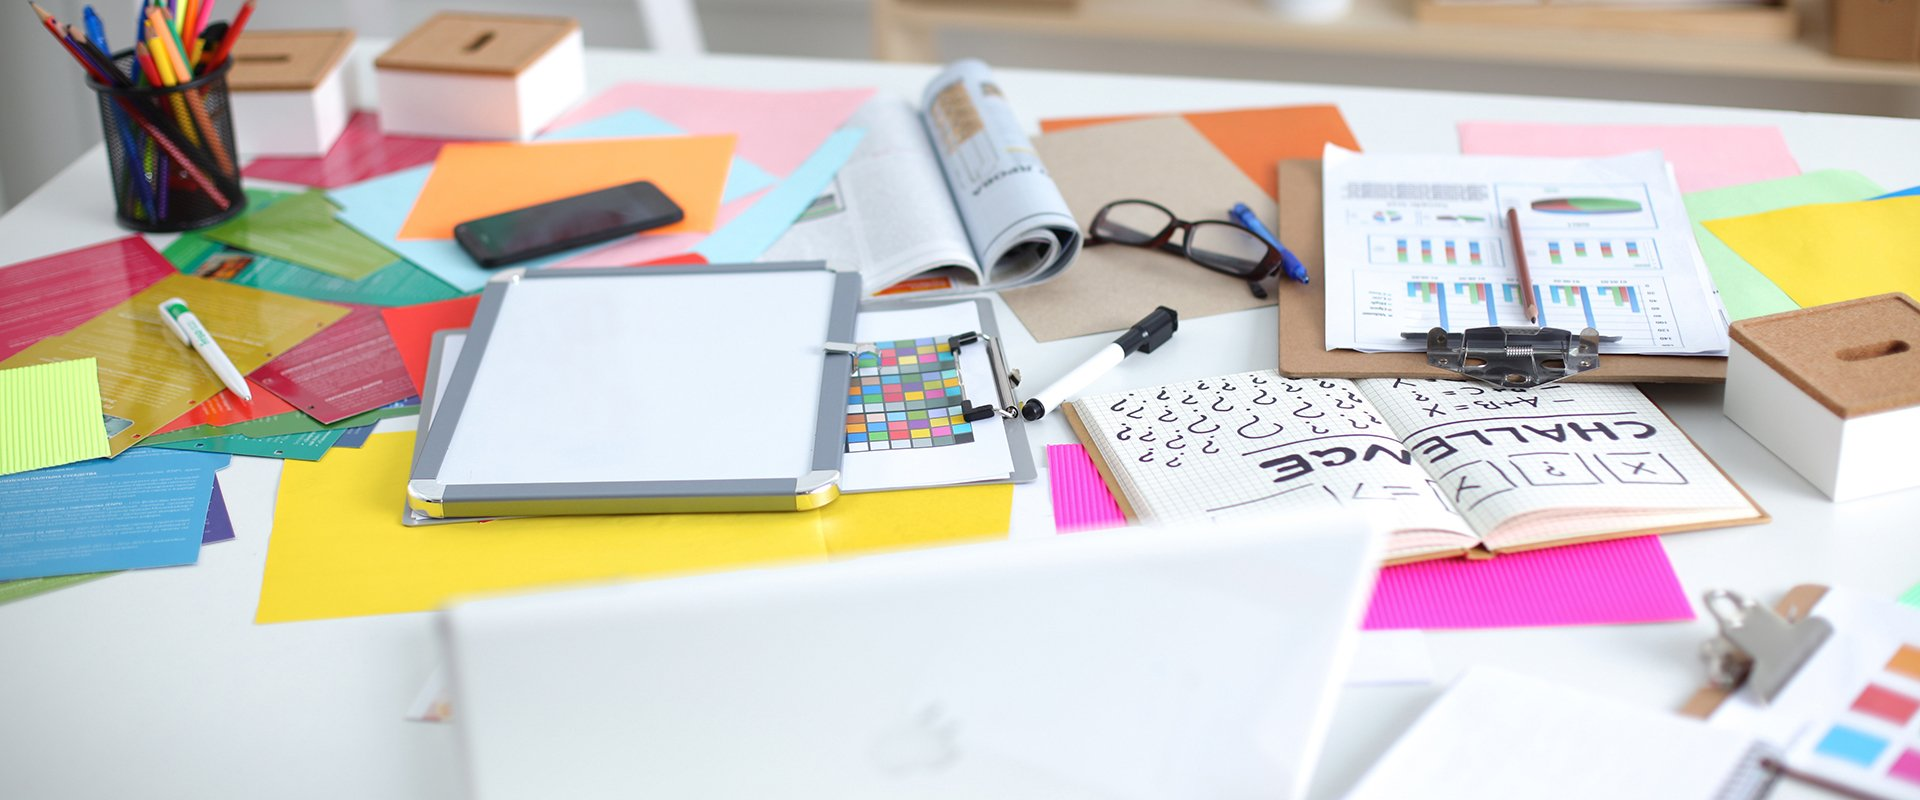 toronto-graphic-designer-desktop-and-design-services